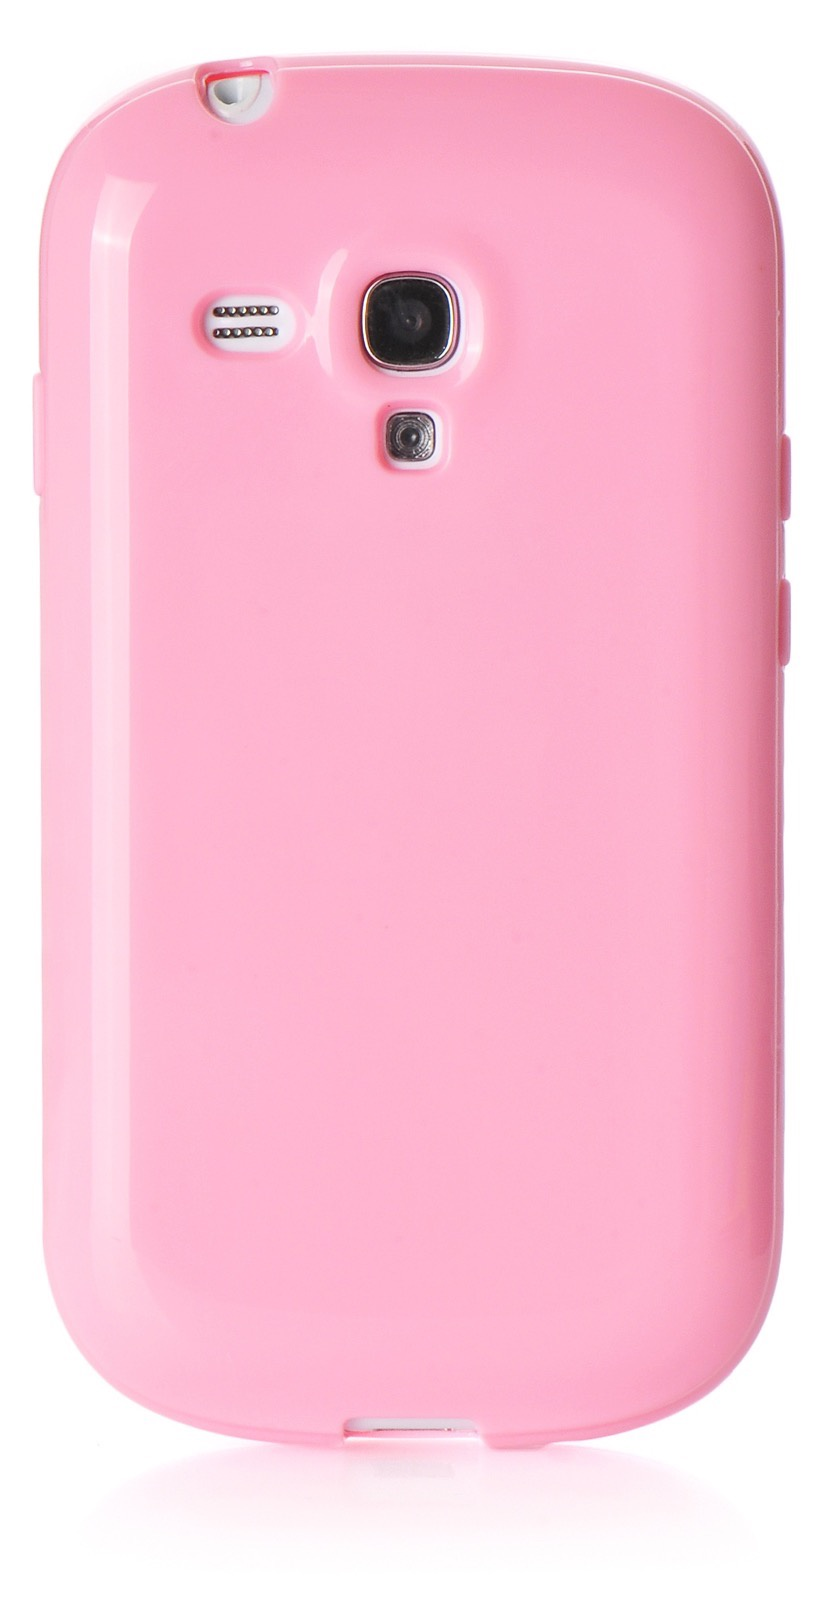 Чехол для Samsung Galaxy S3 mini накладка силикон мыльница pink для Samsung Galaxy S3 mini